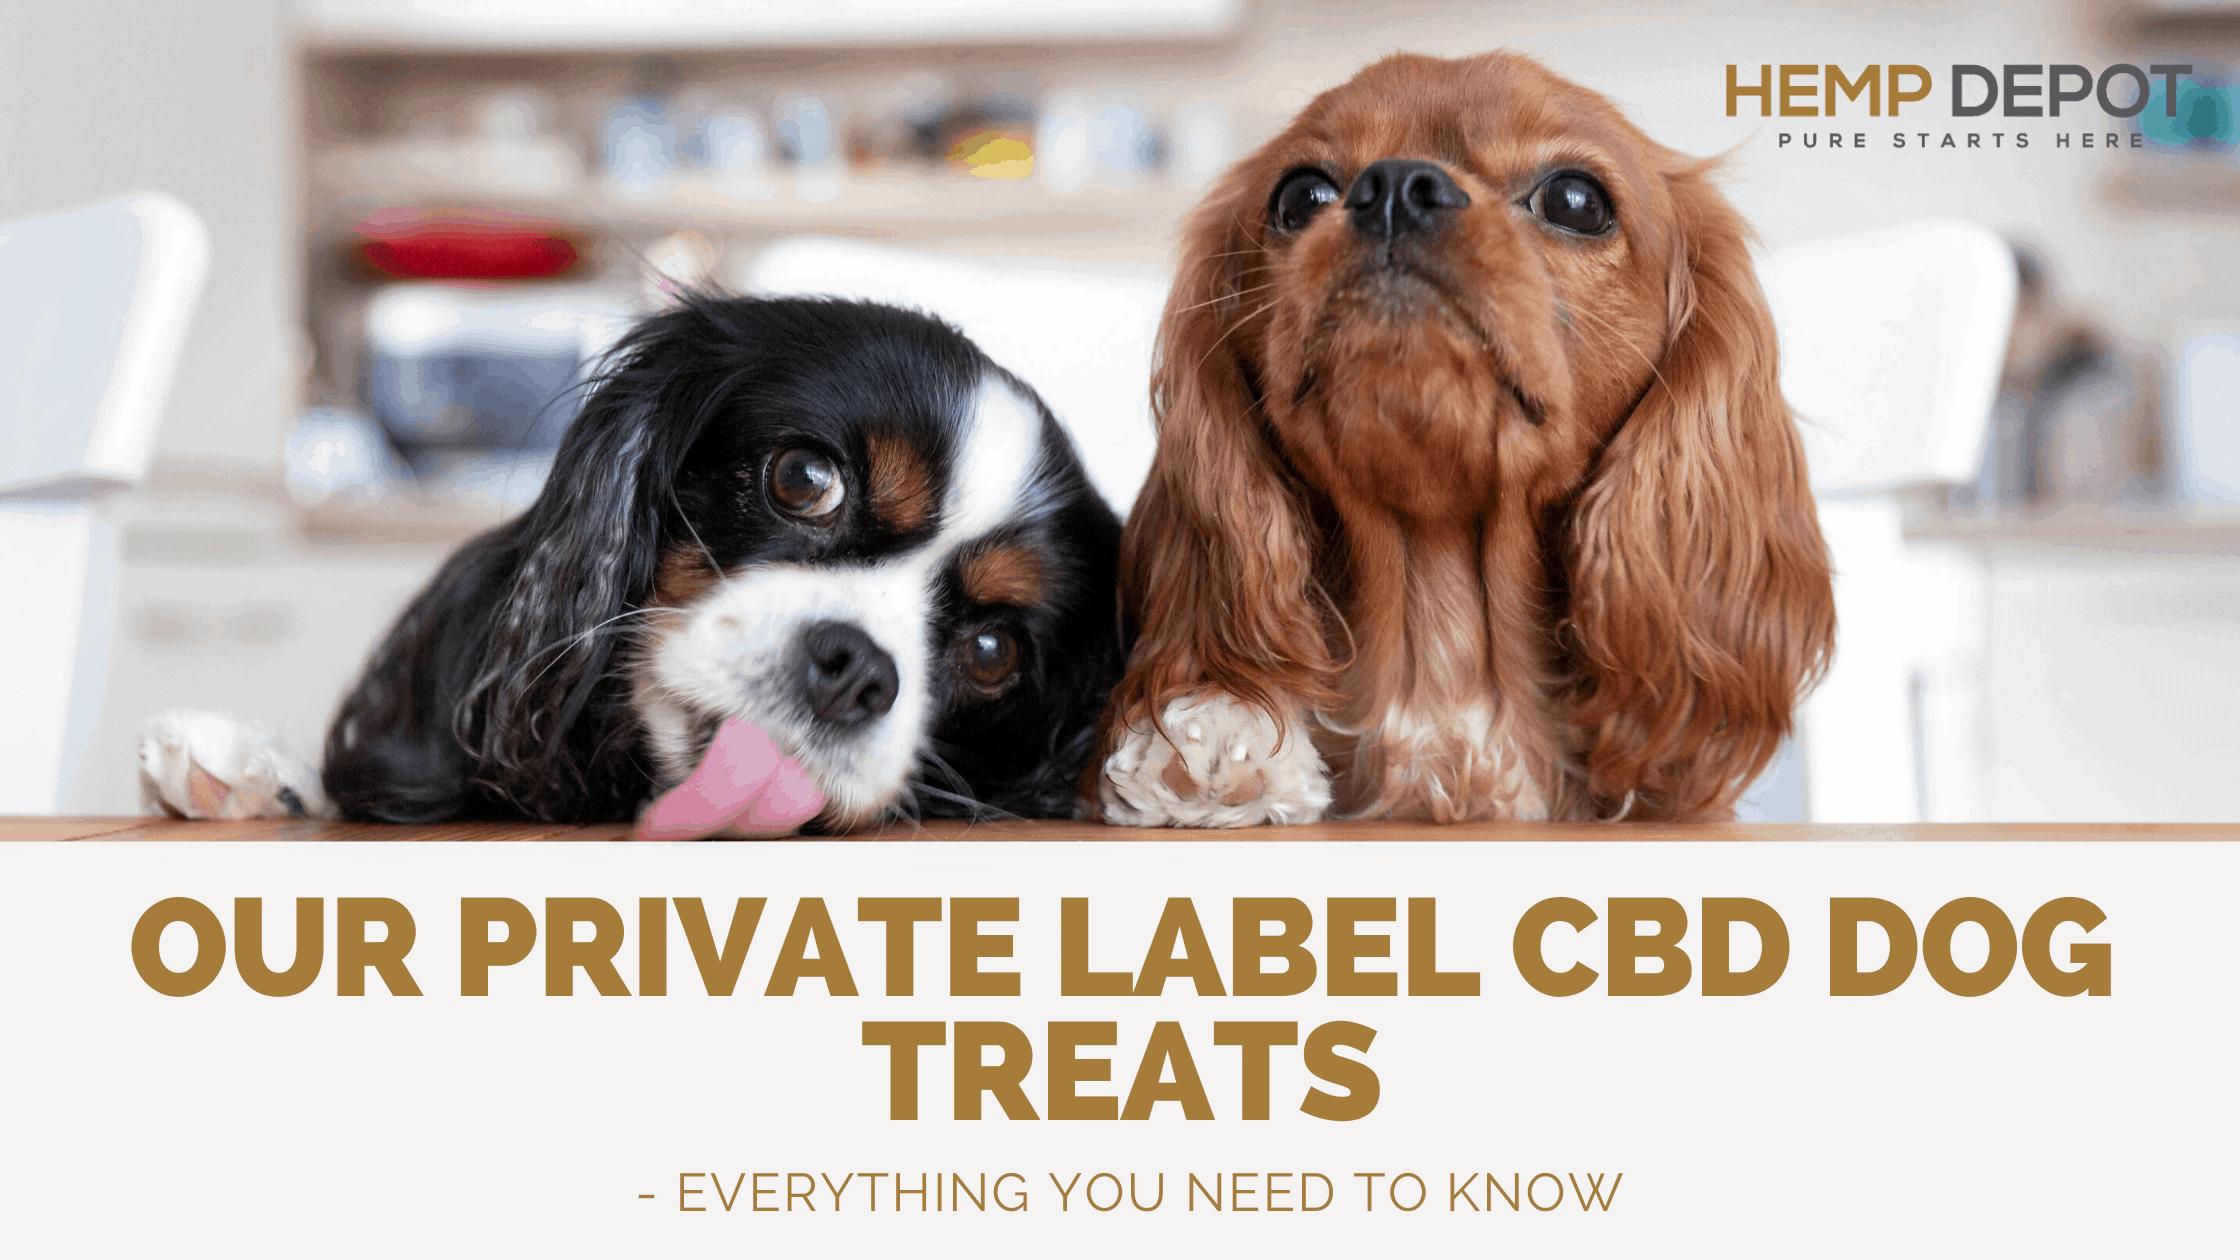 private label cbd dog treats hemp depot